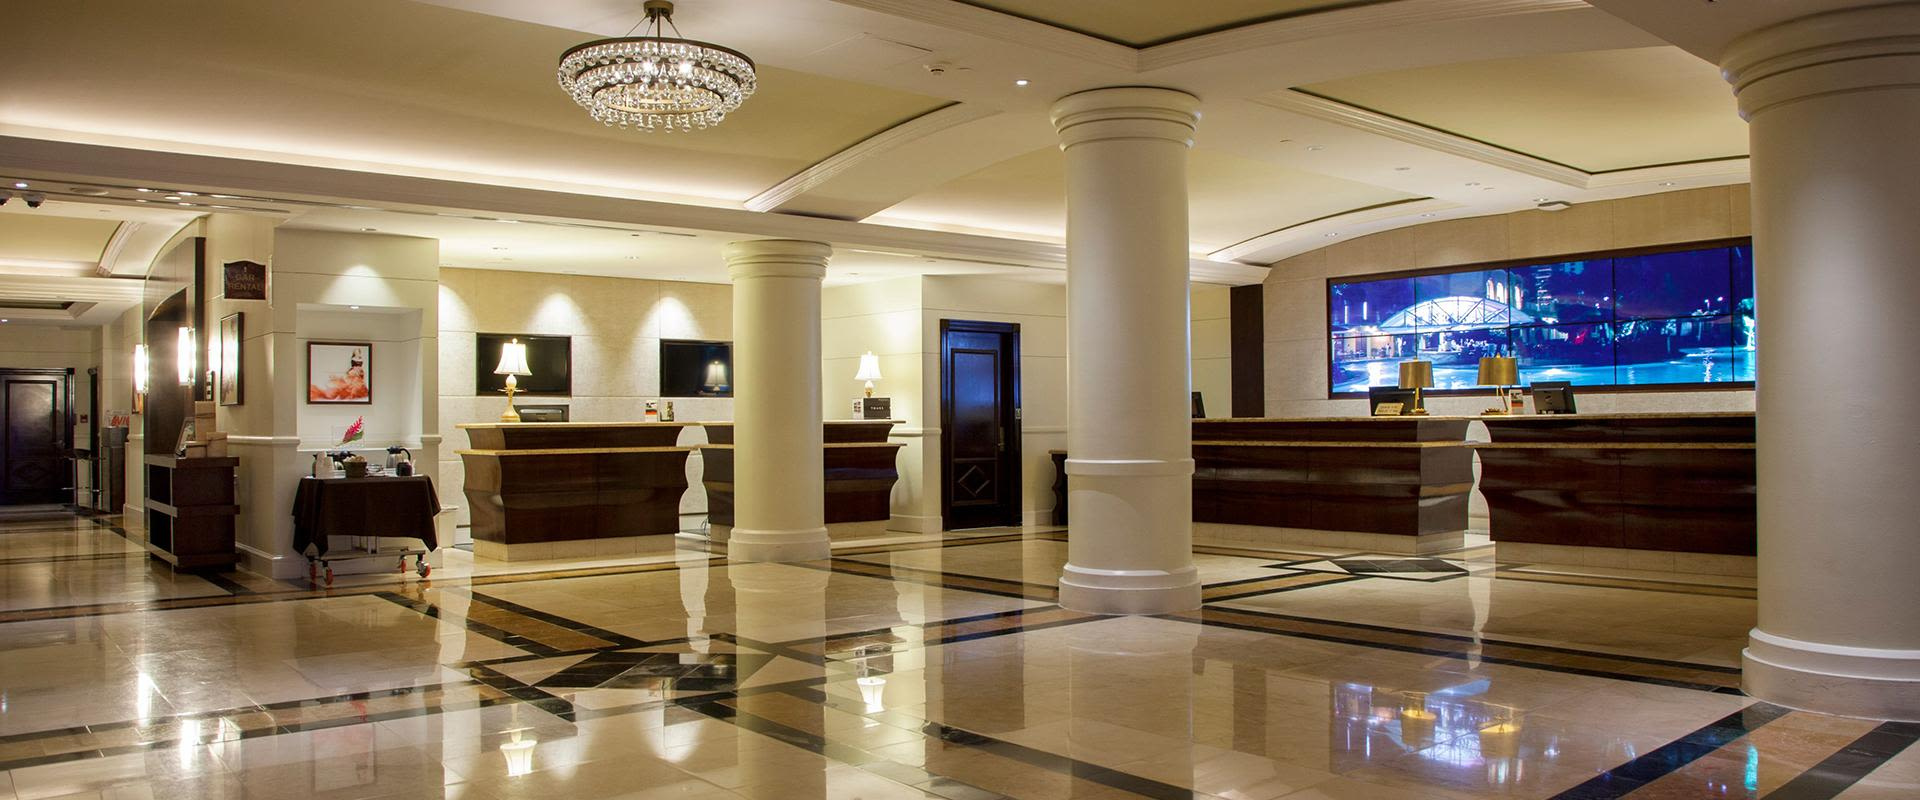 San Juan Resort Front Desk Lobby